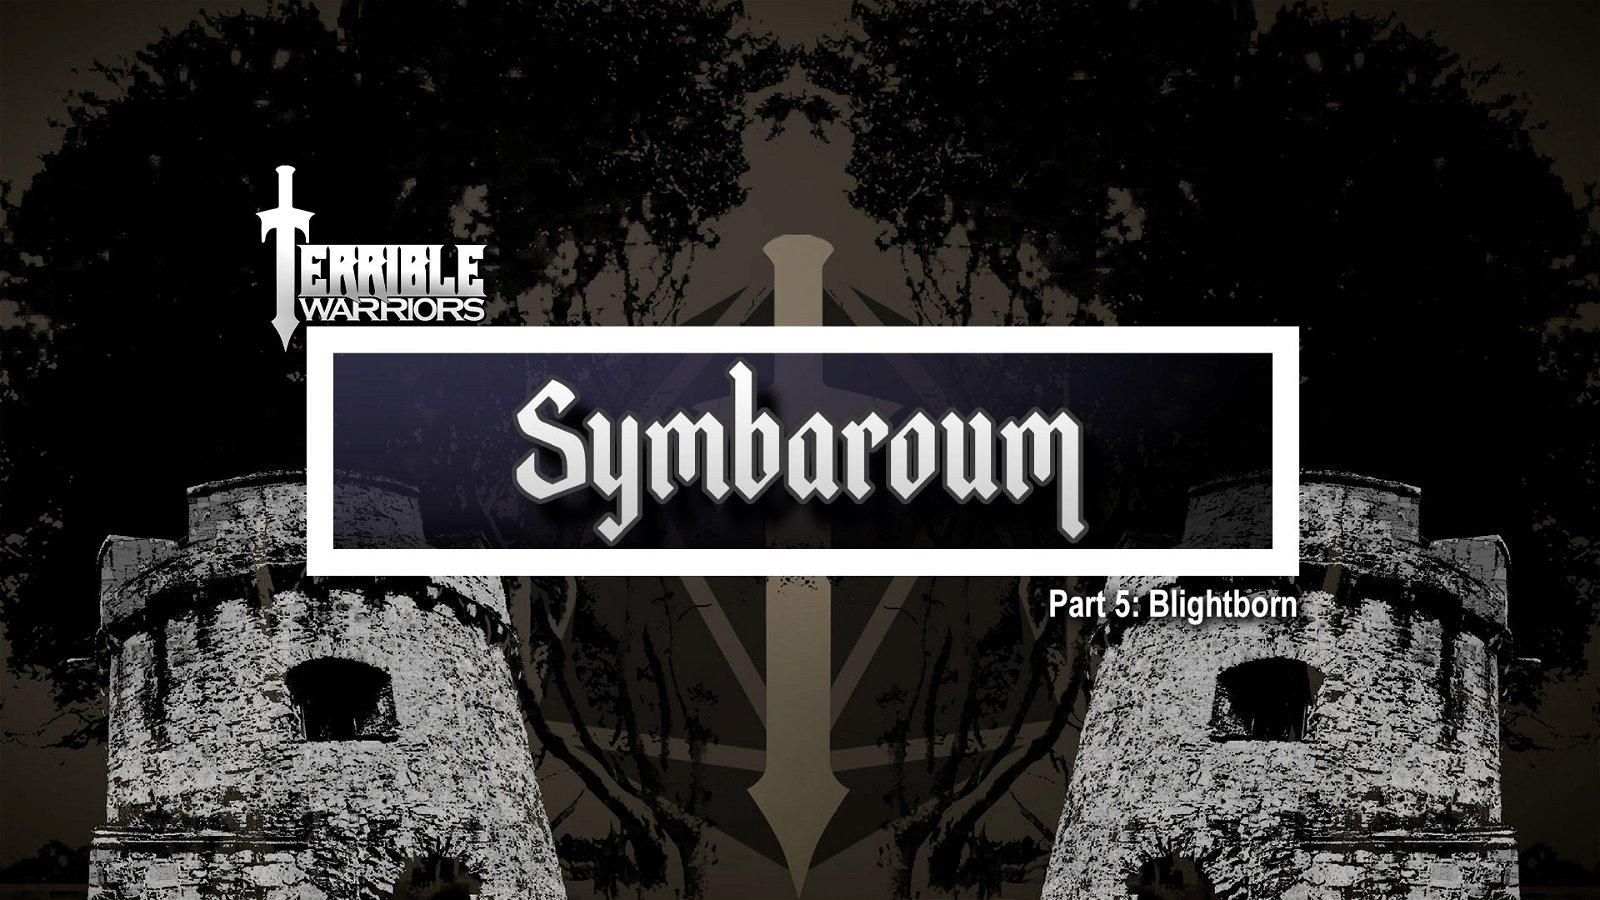 Terrible Warriors: Symbaroum, Part 5